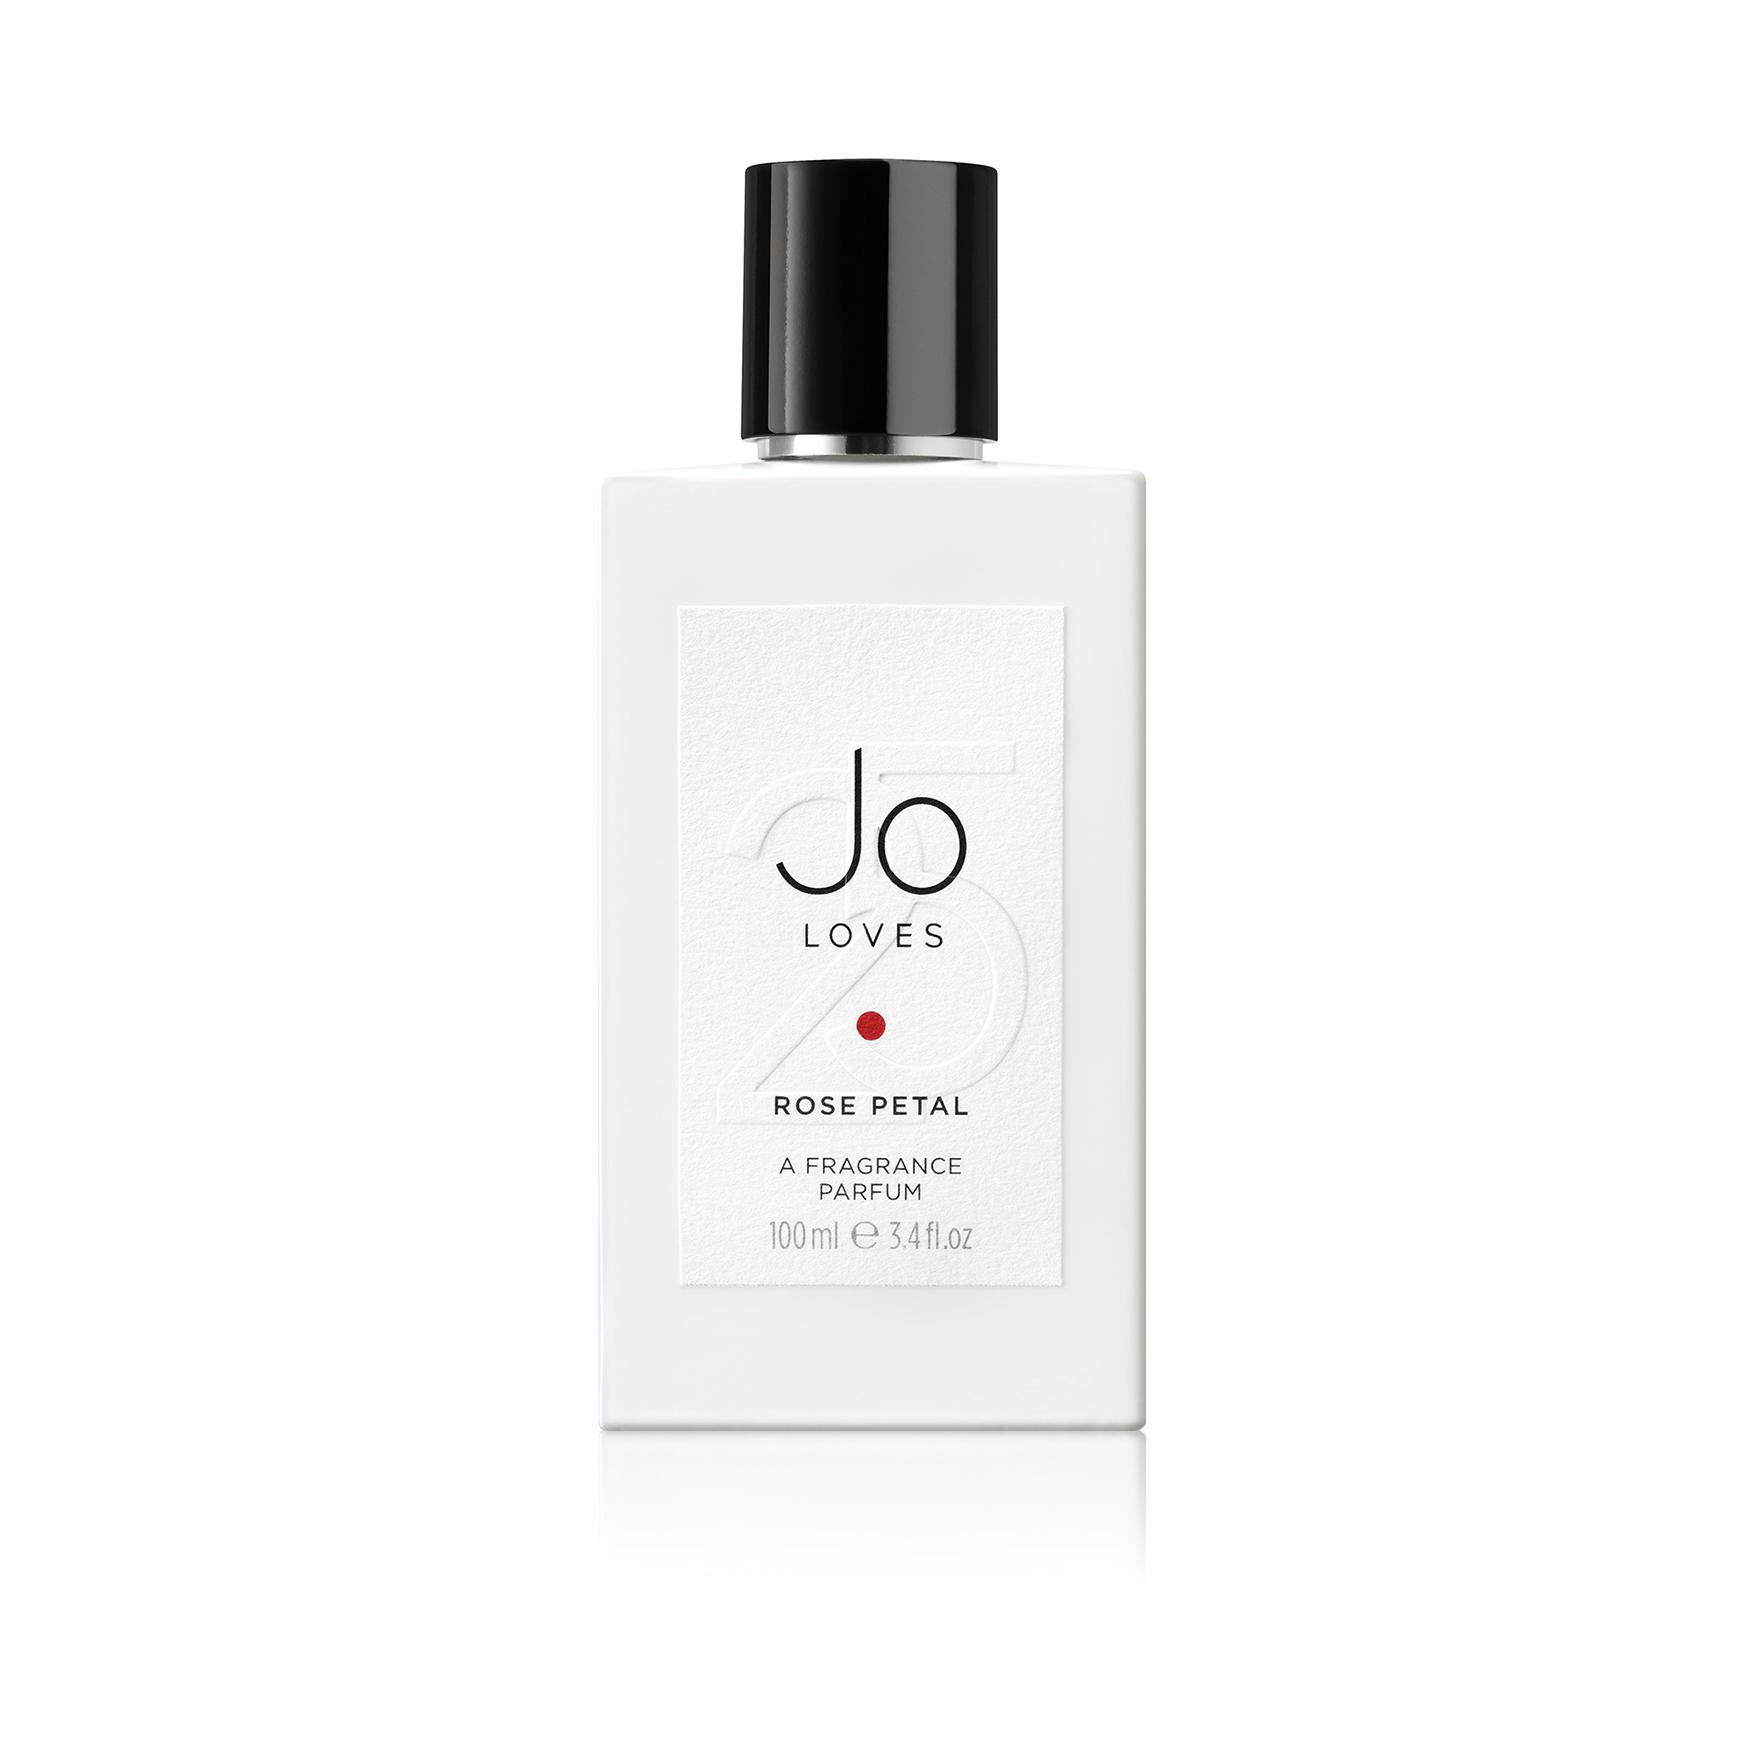 Fragrance Perfume Space Nk